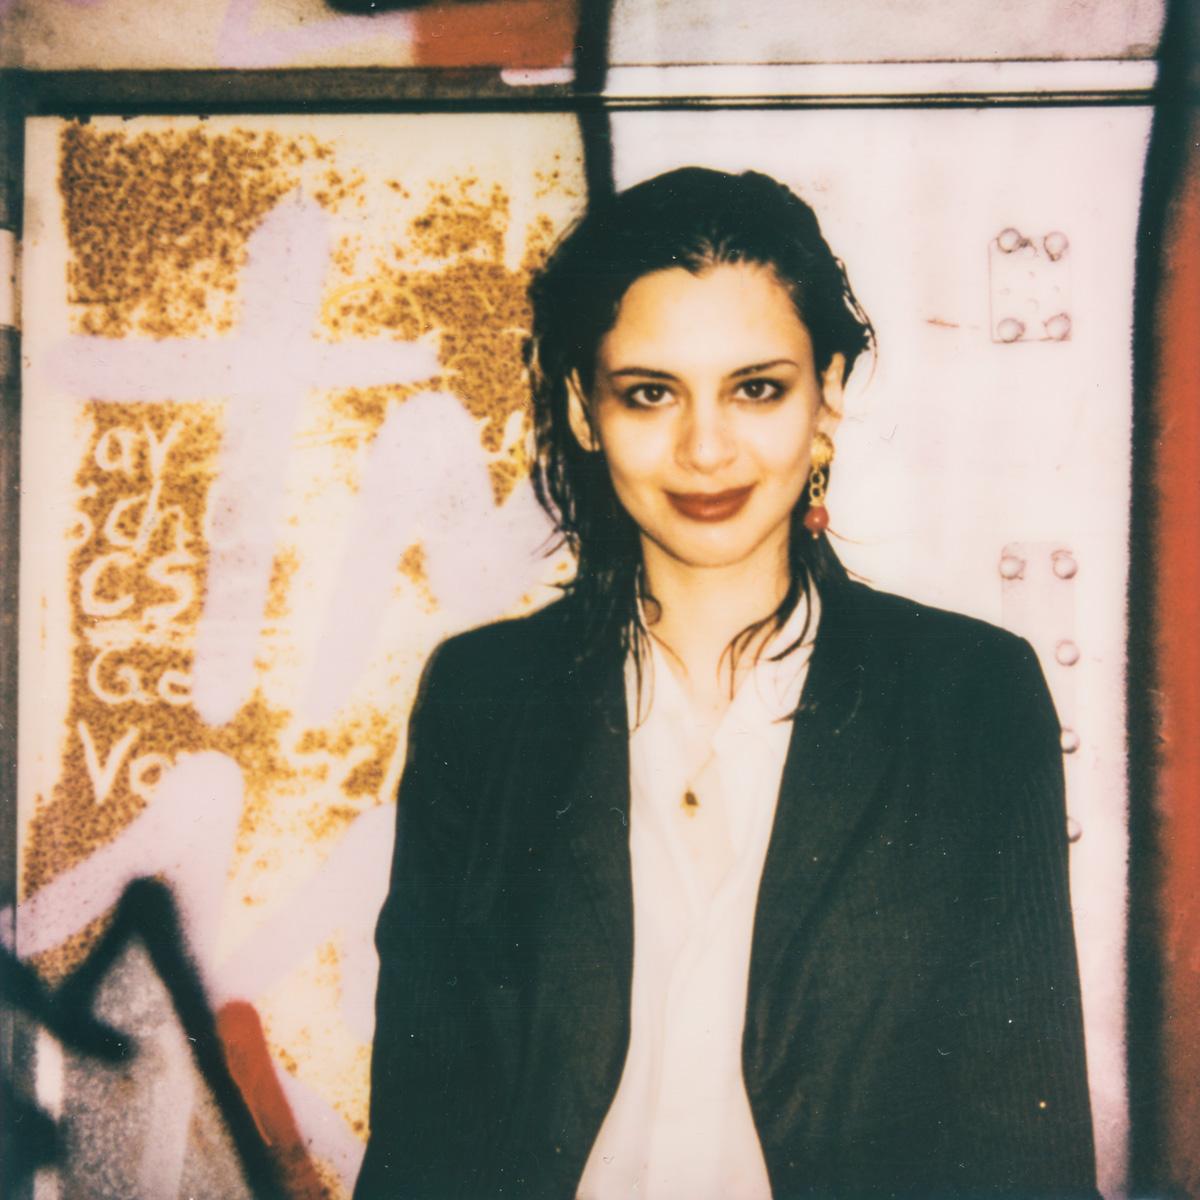 Sofia Iordanskaya